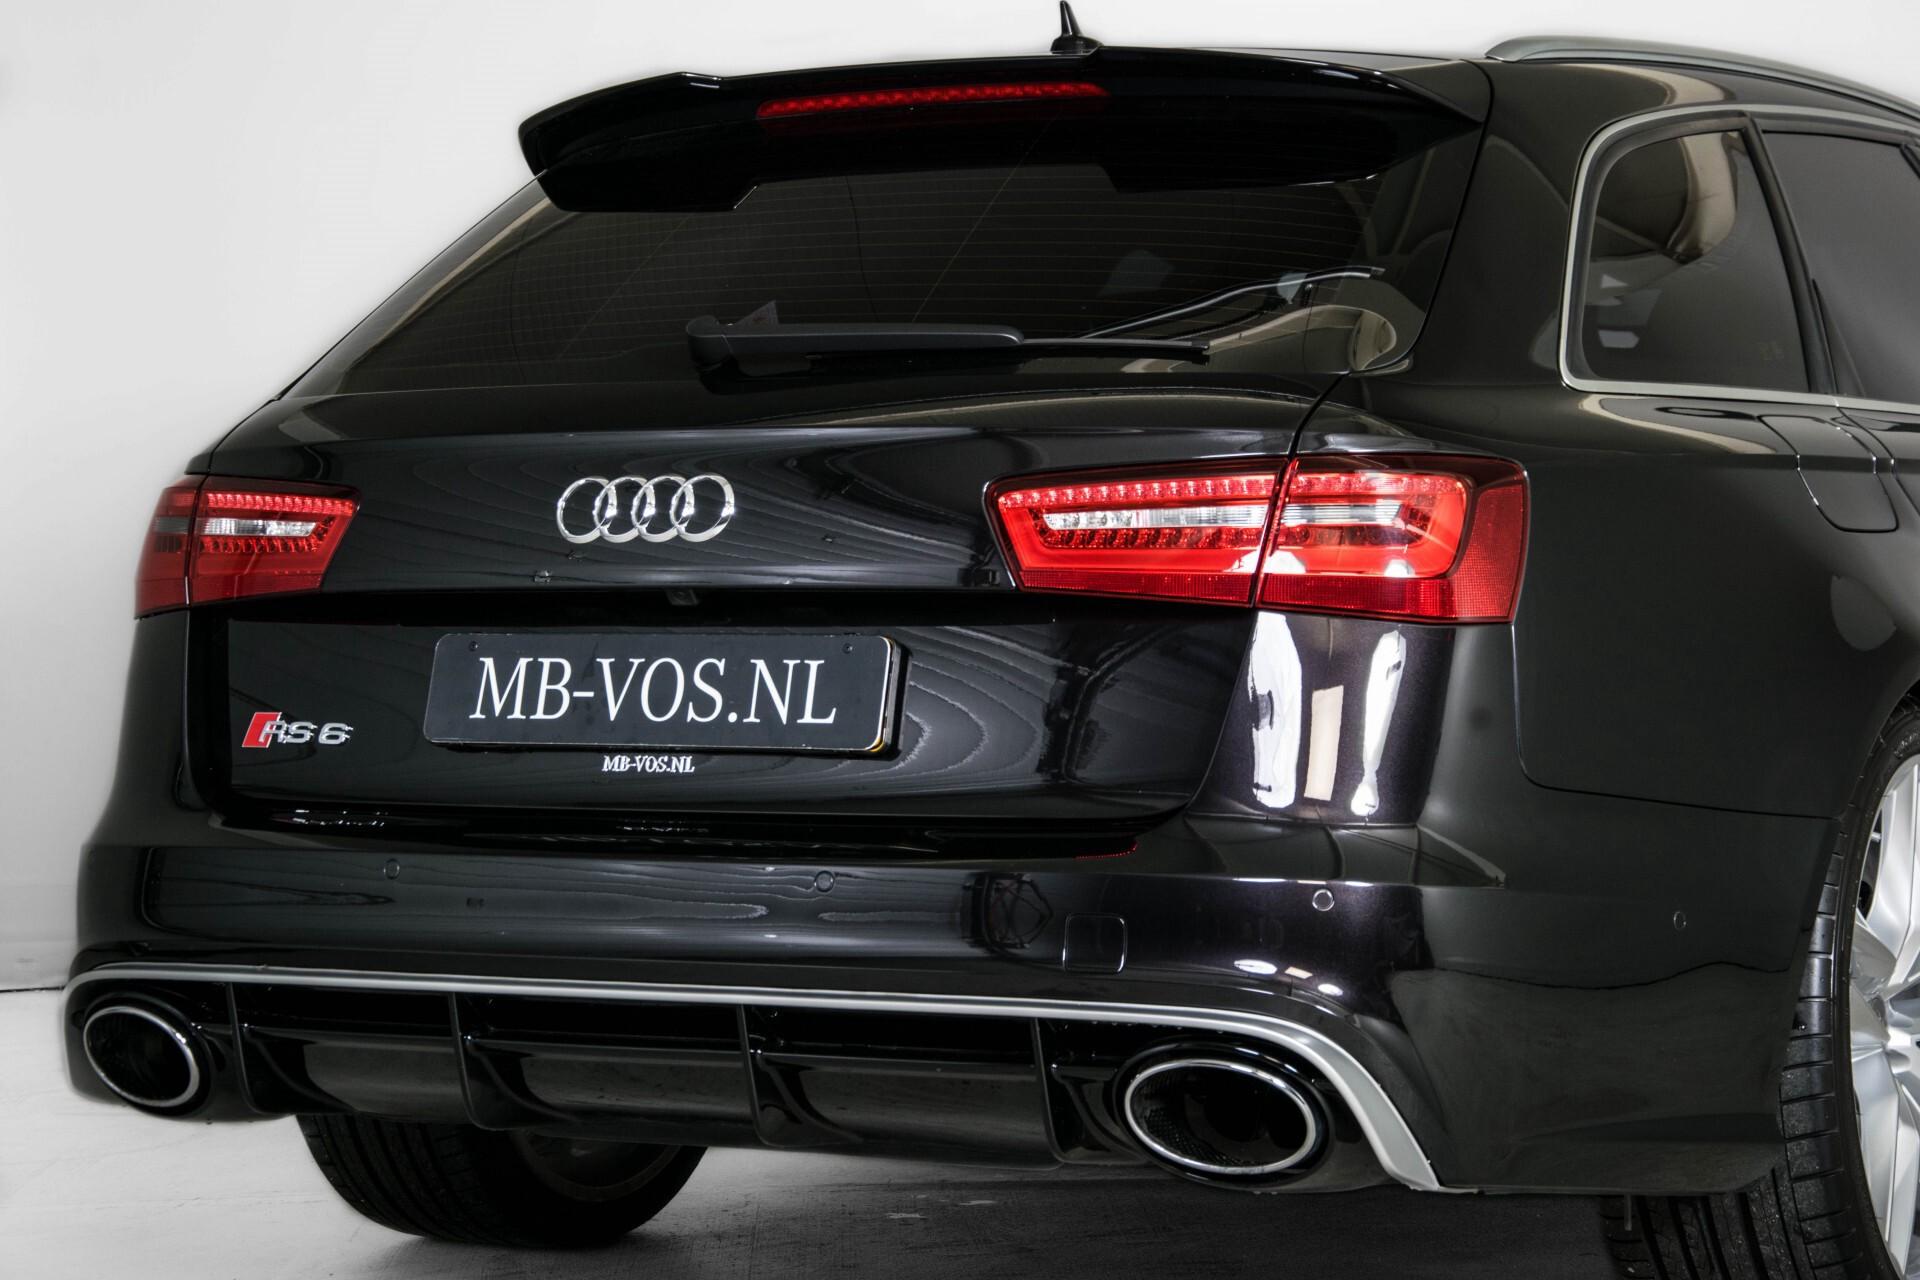 Audi RS6 Avant 4.0 TFSI Quattro B&O/Carbon/Head-Up/Nachtzicht/Exclusive/Camera/Keyless/Pano Aut8 Foto 41